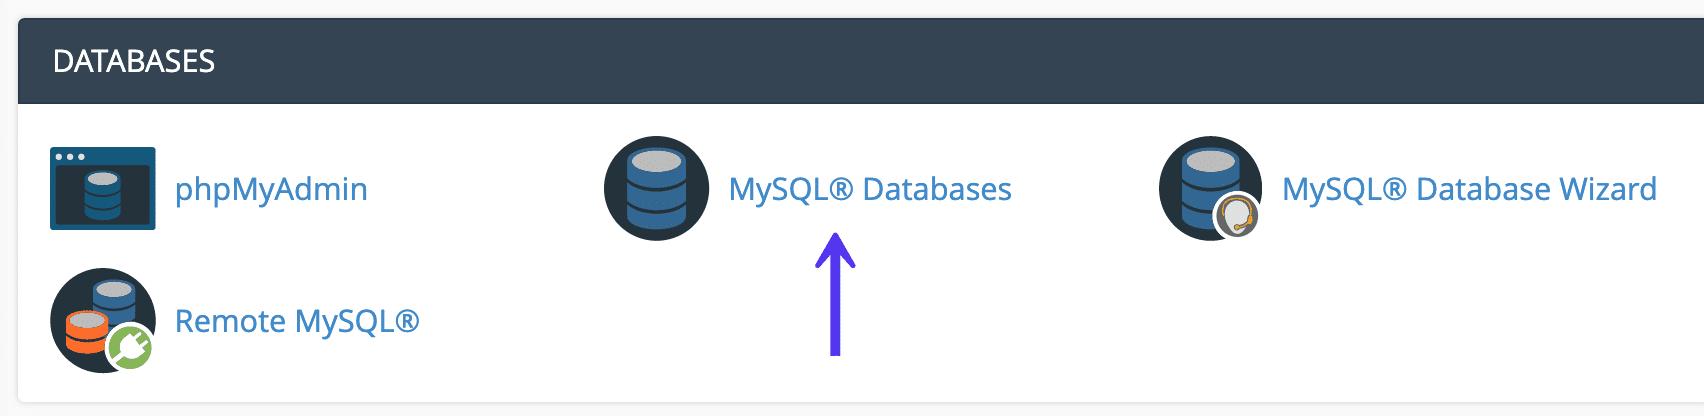 Bases de dados MySQL no cPanel